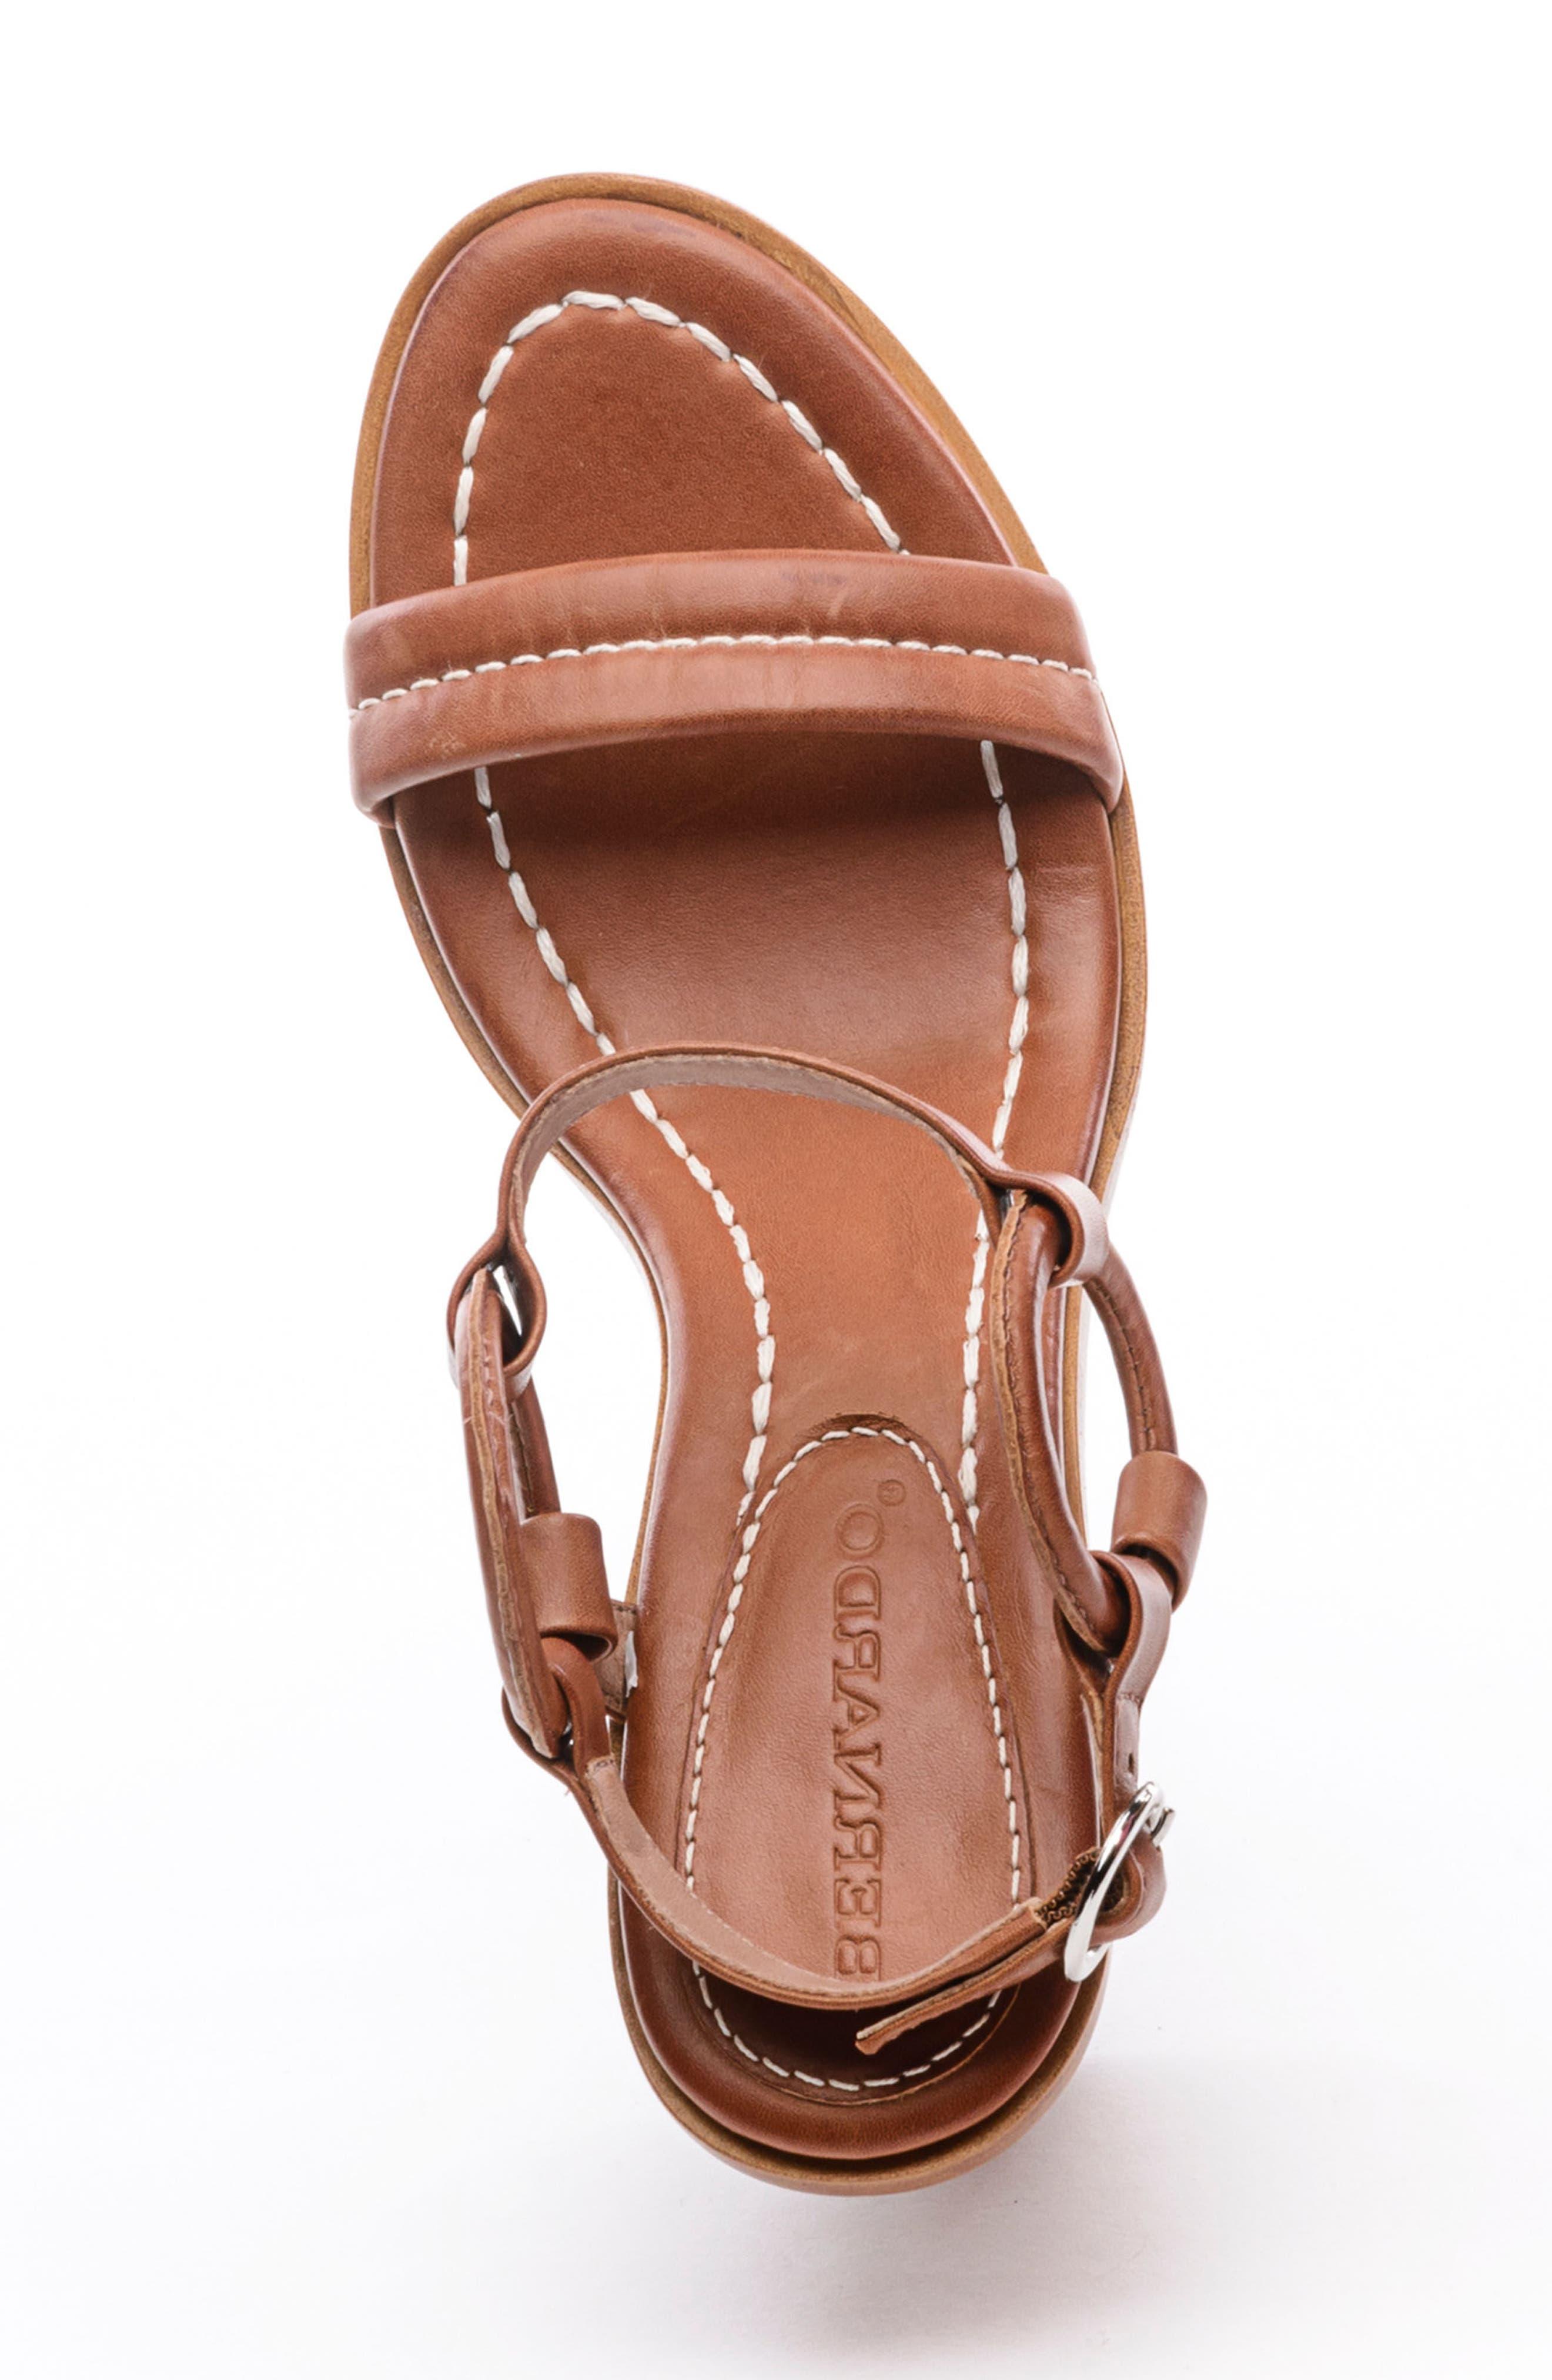 Bernardo Harlow Ankle Strap Sandal,                             Alternate thumbnail 5, color,                             Luggage Leather